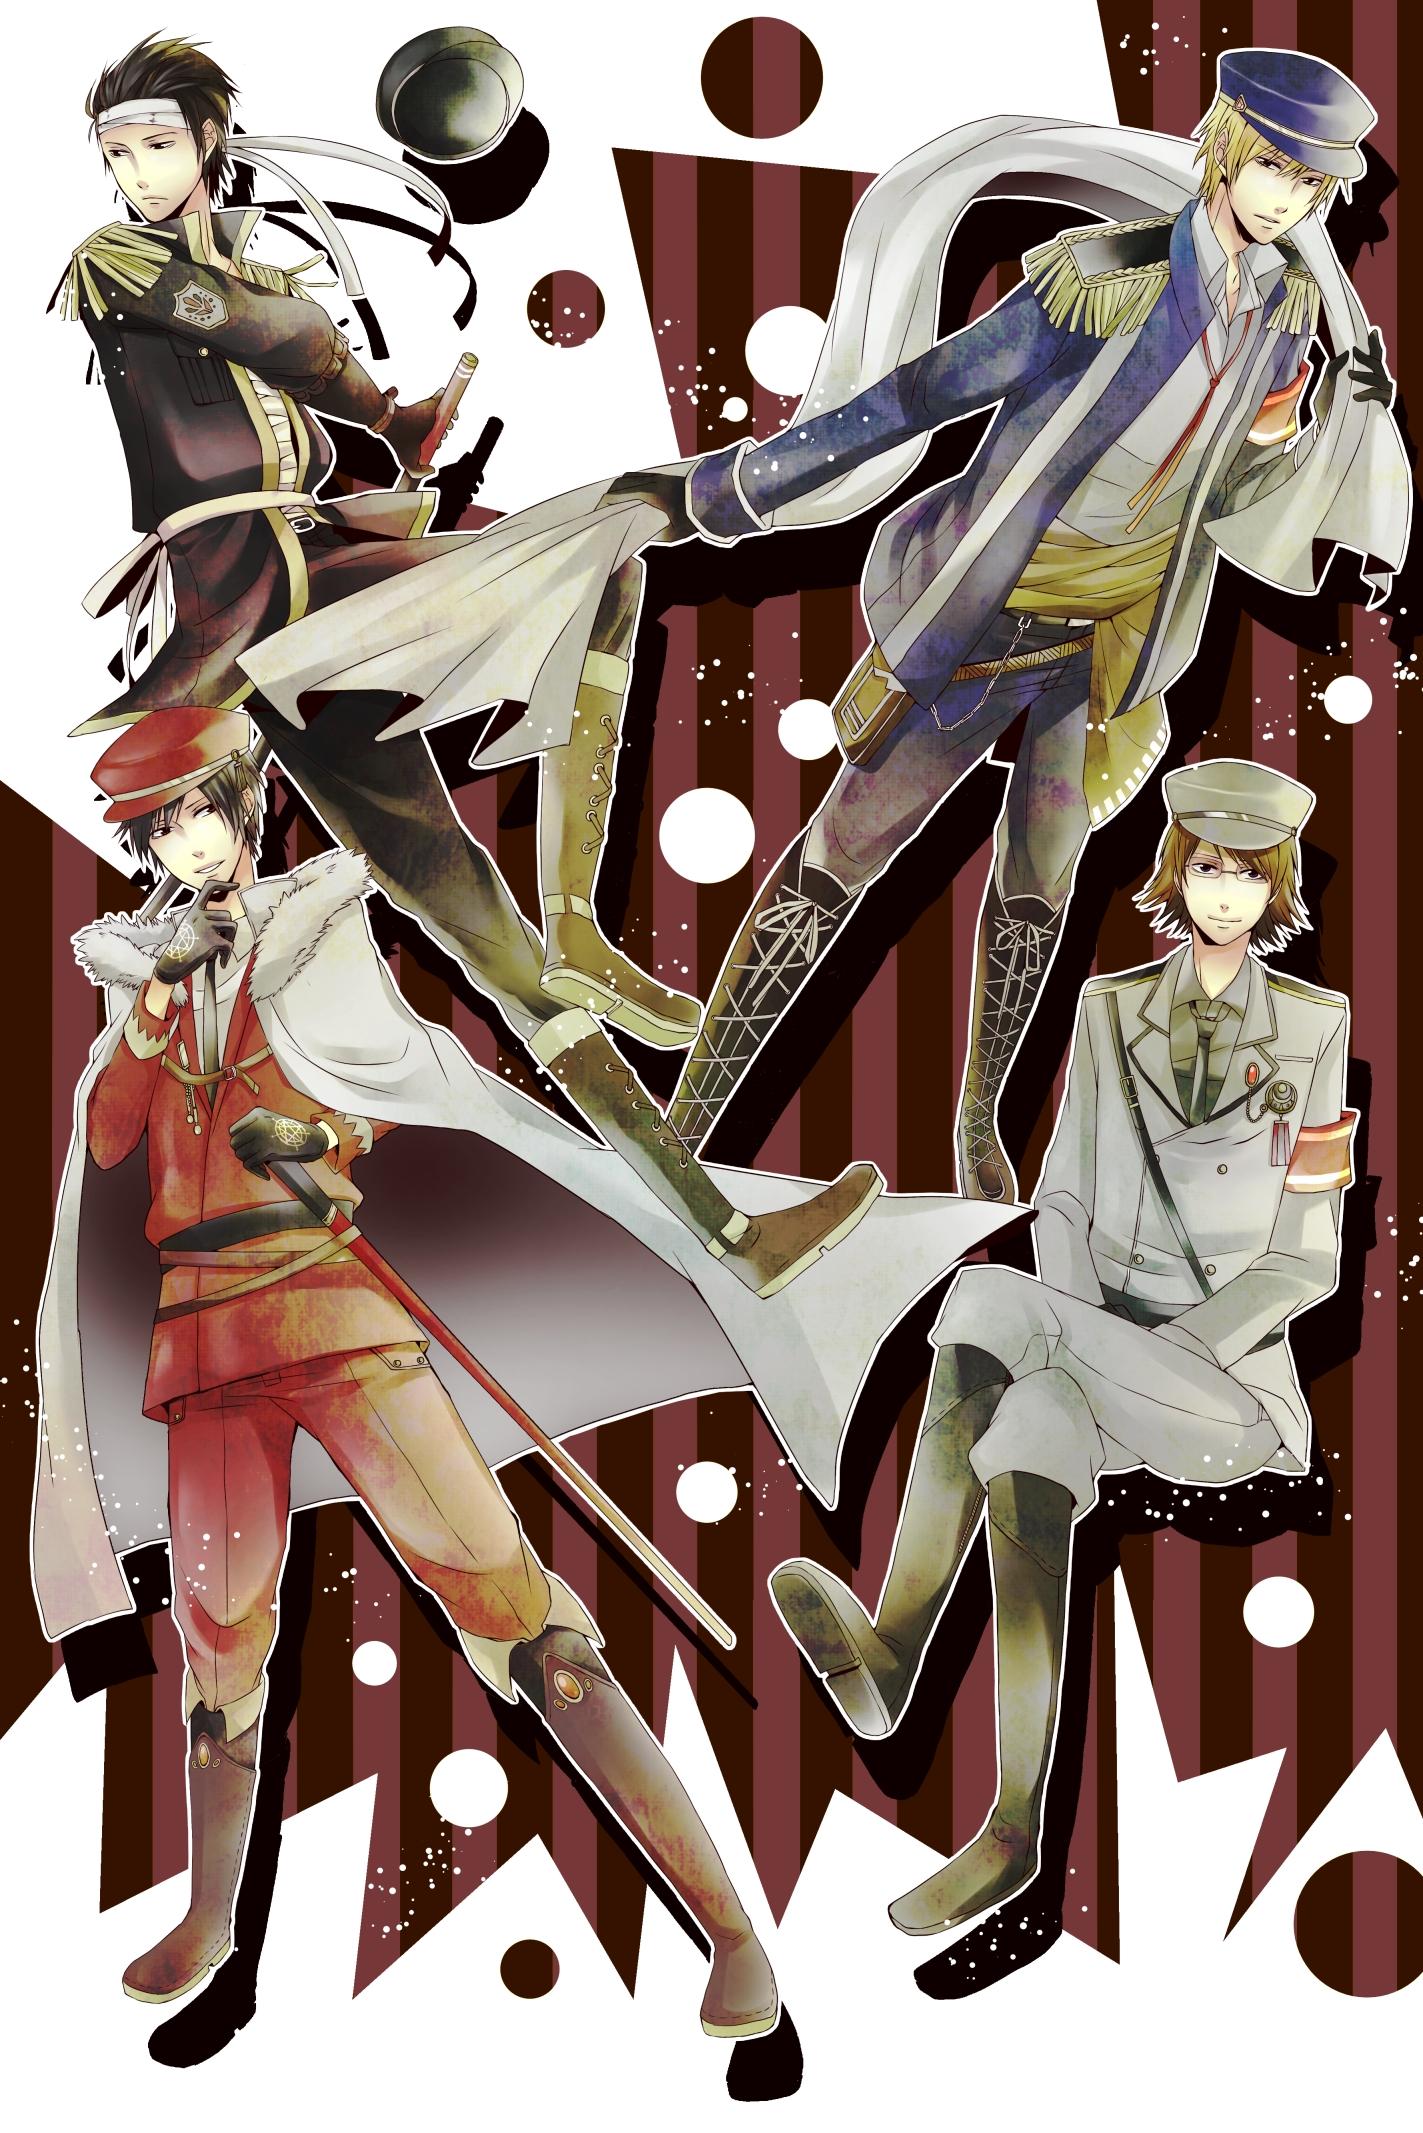 durarara mobile wallpaper 274329 zerochan anime image board zerochan